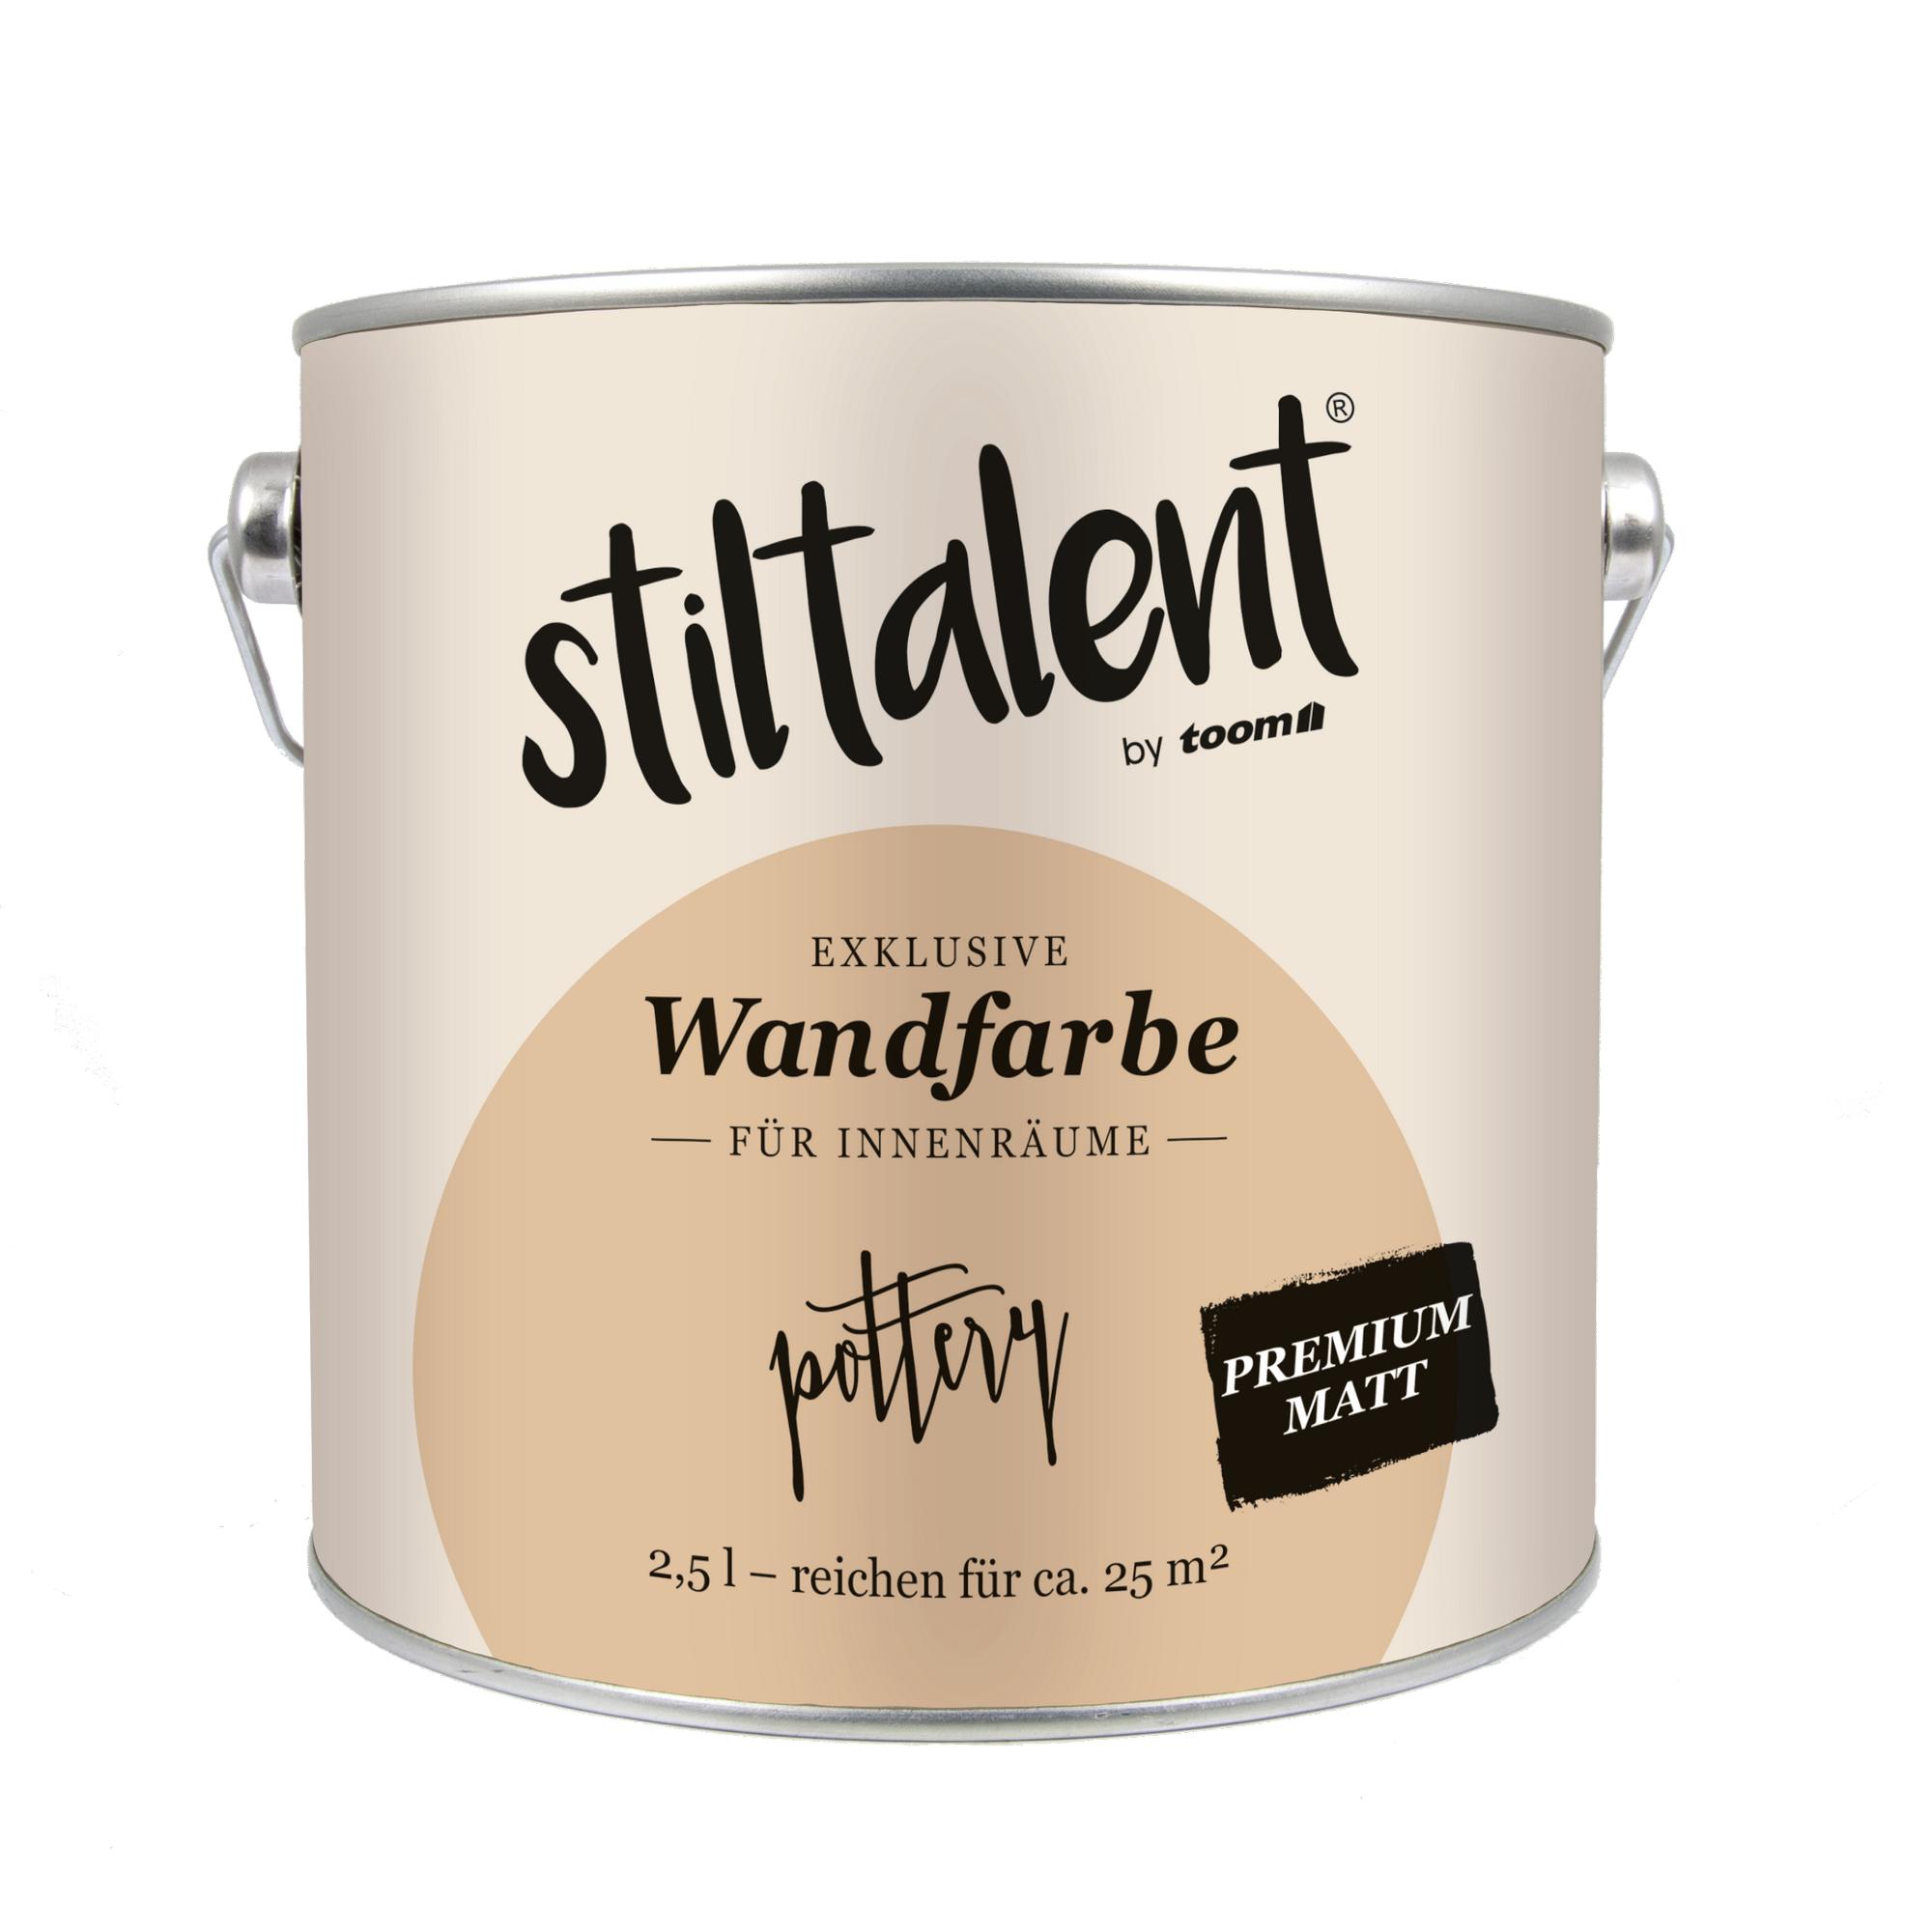 Stiltalent Wandfarbe Pottery Premium Matt 2,5 L